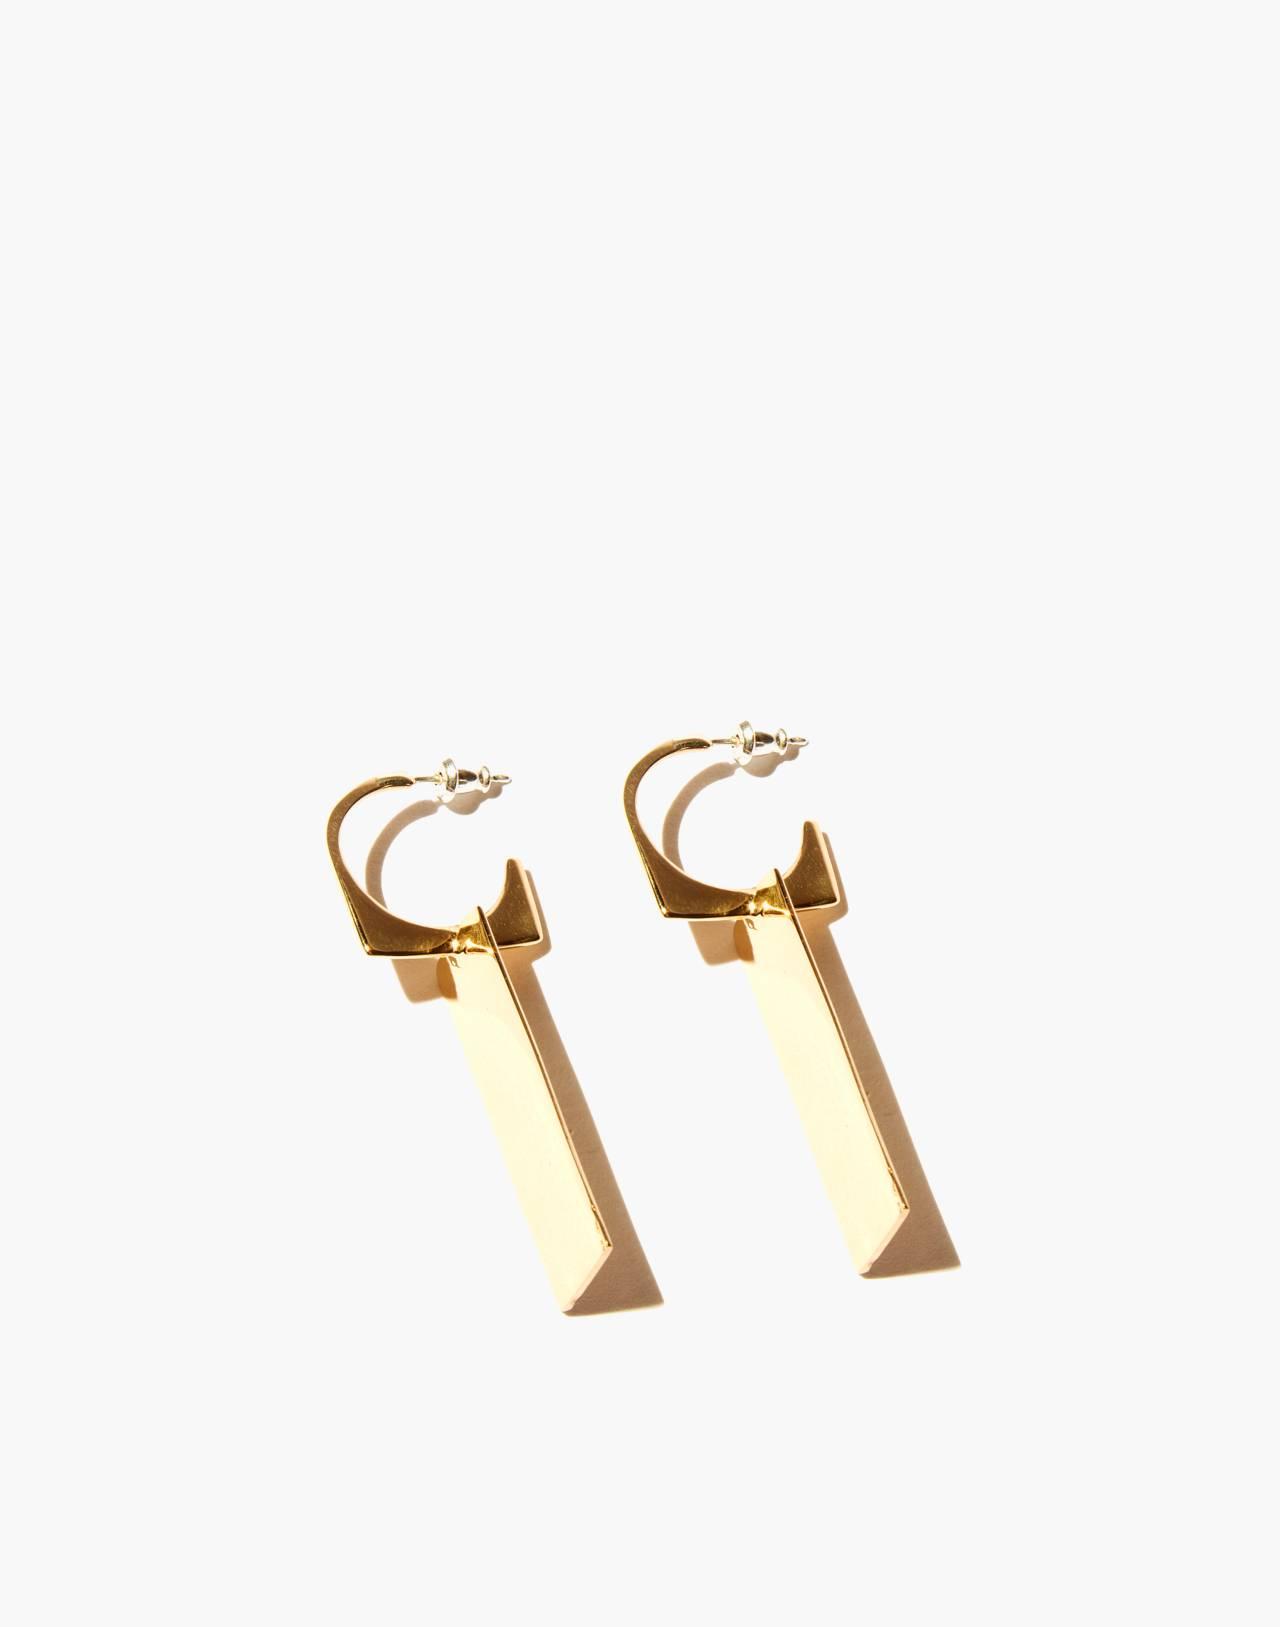 Odette New York® Cadre Earrings in gold image 1